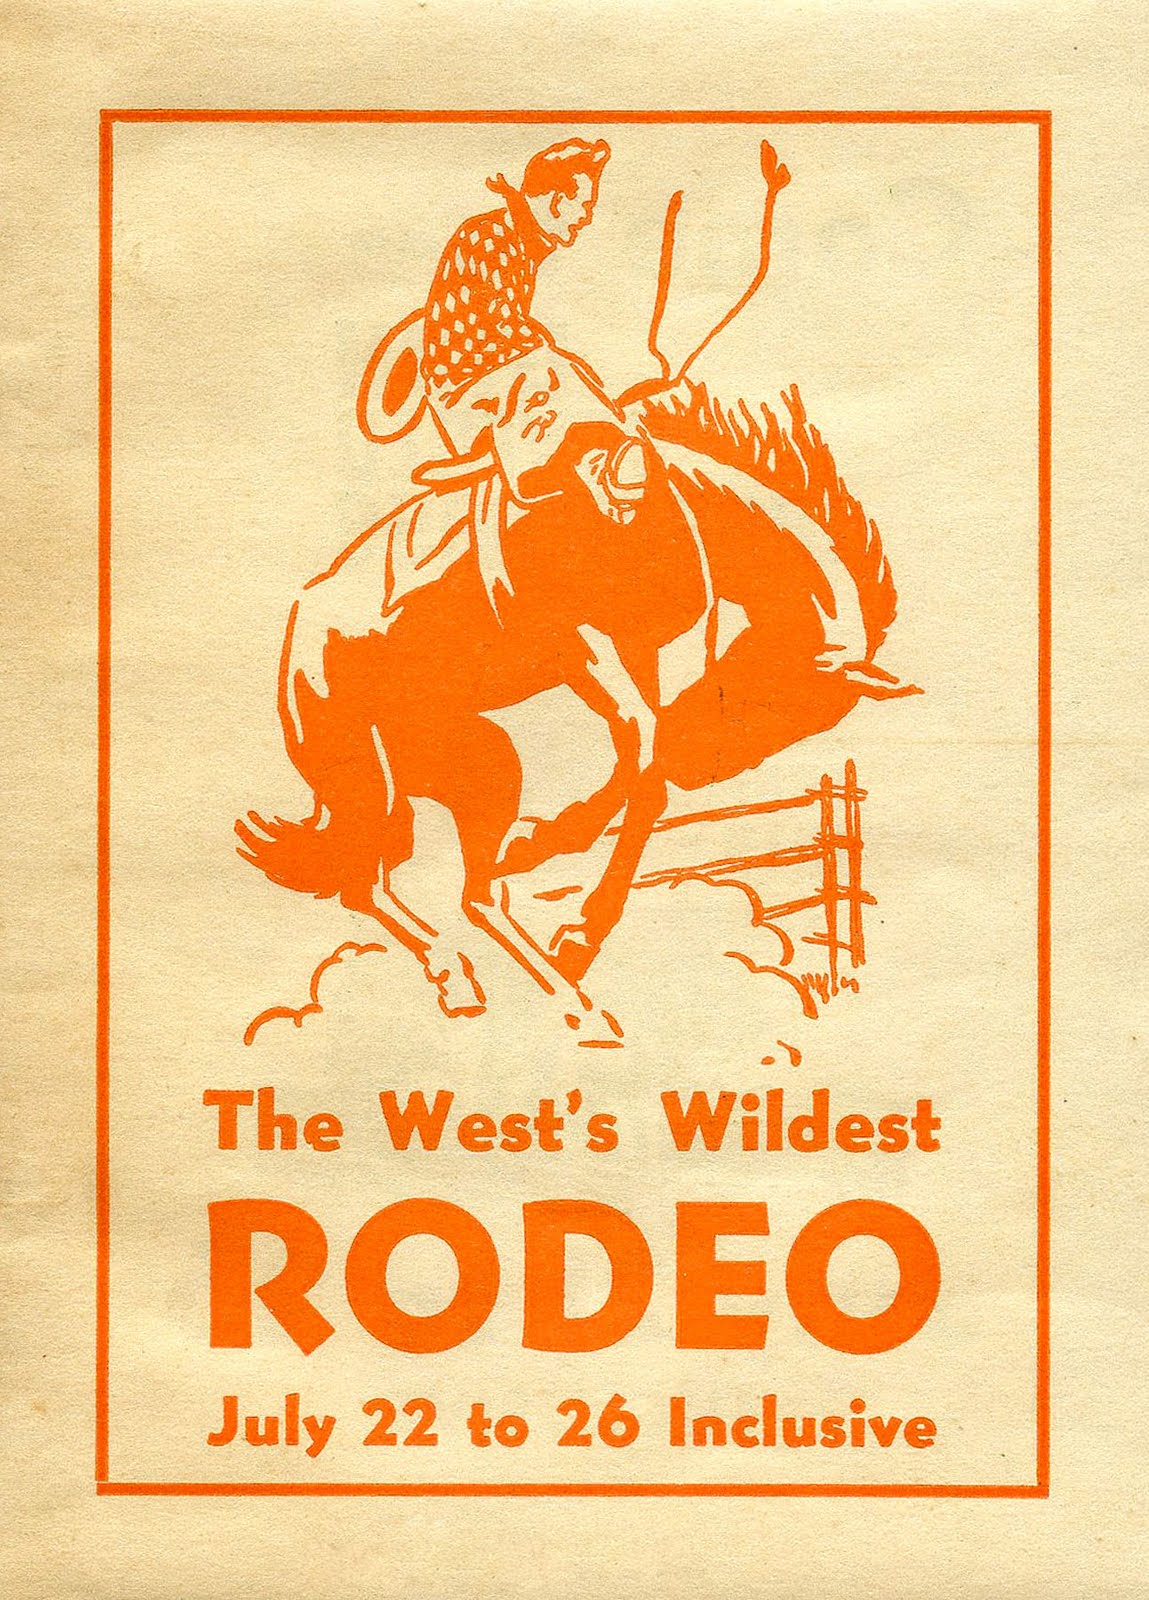 Wild West clipart rodeo West was sticker Rodeo Cowboy